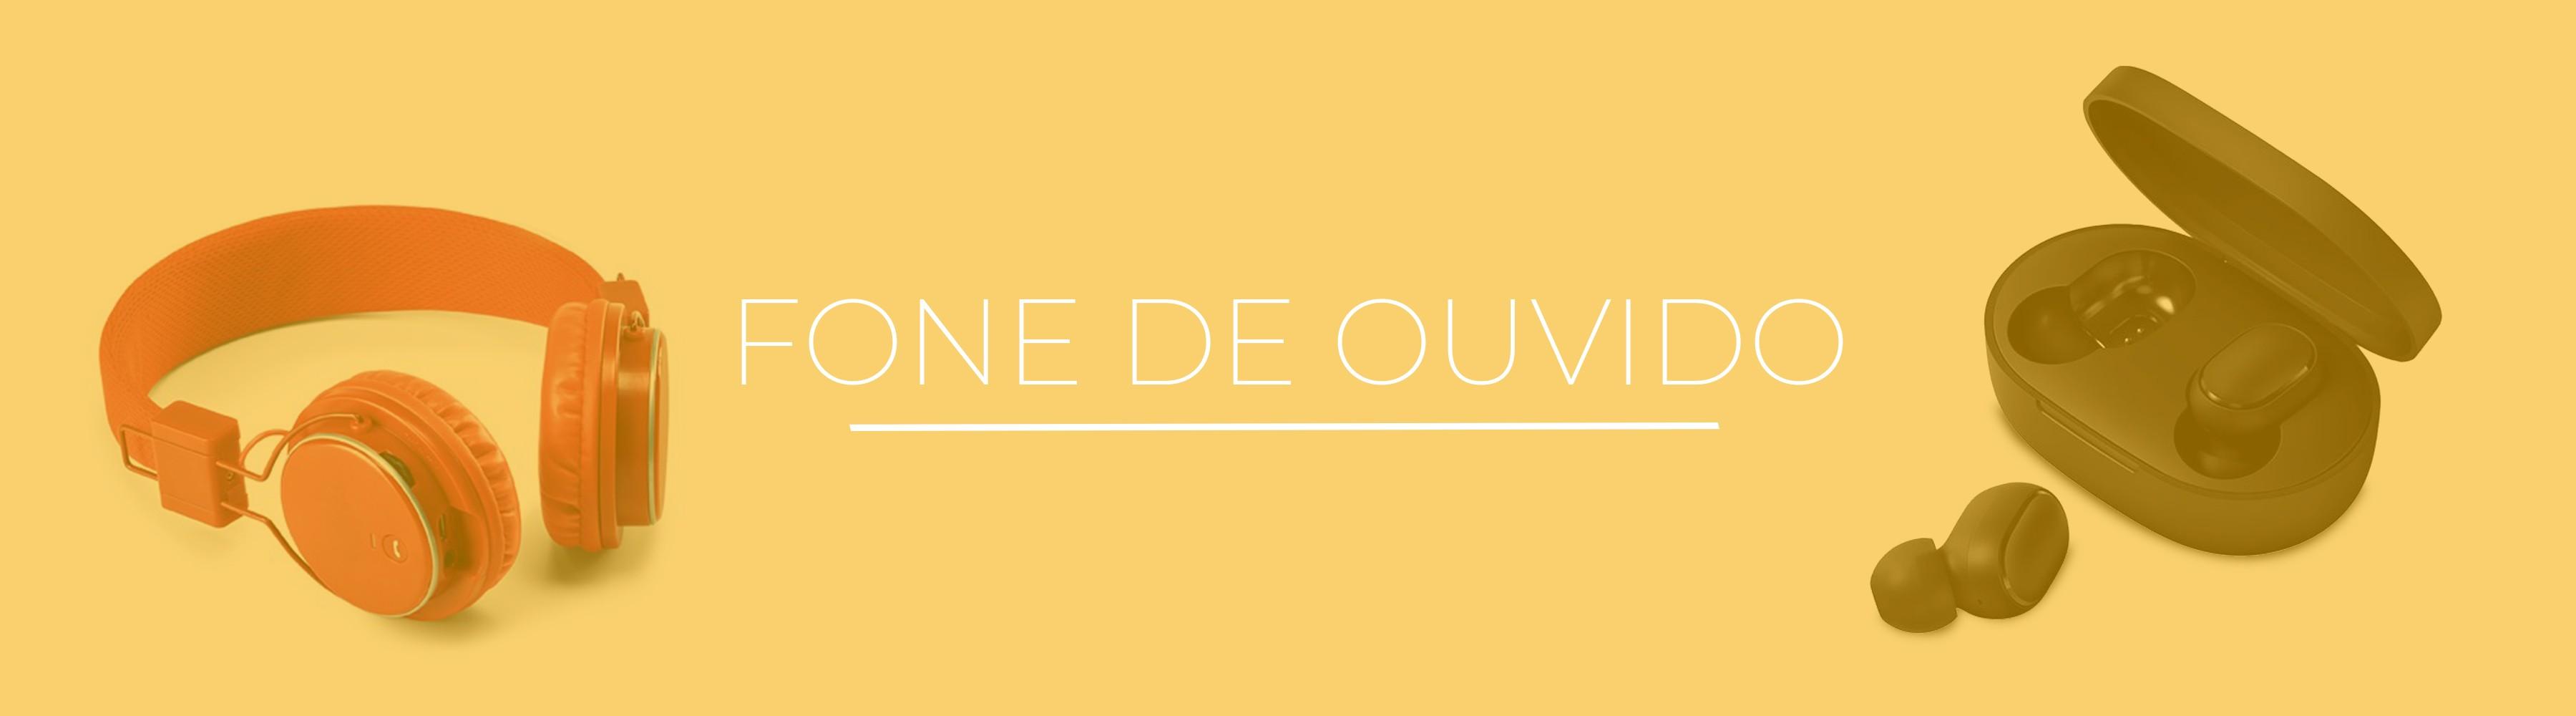 Banner Fone de Ouvido